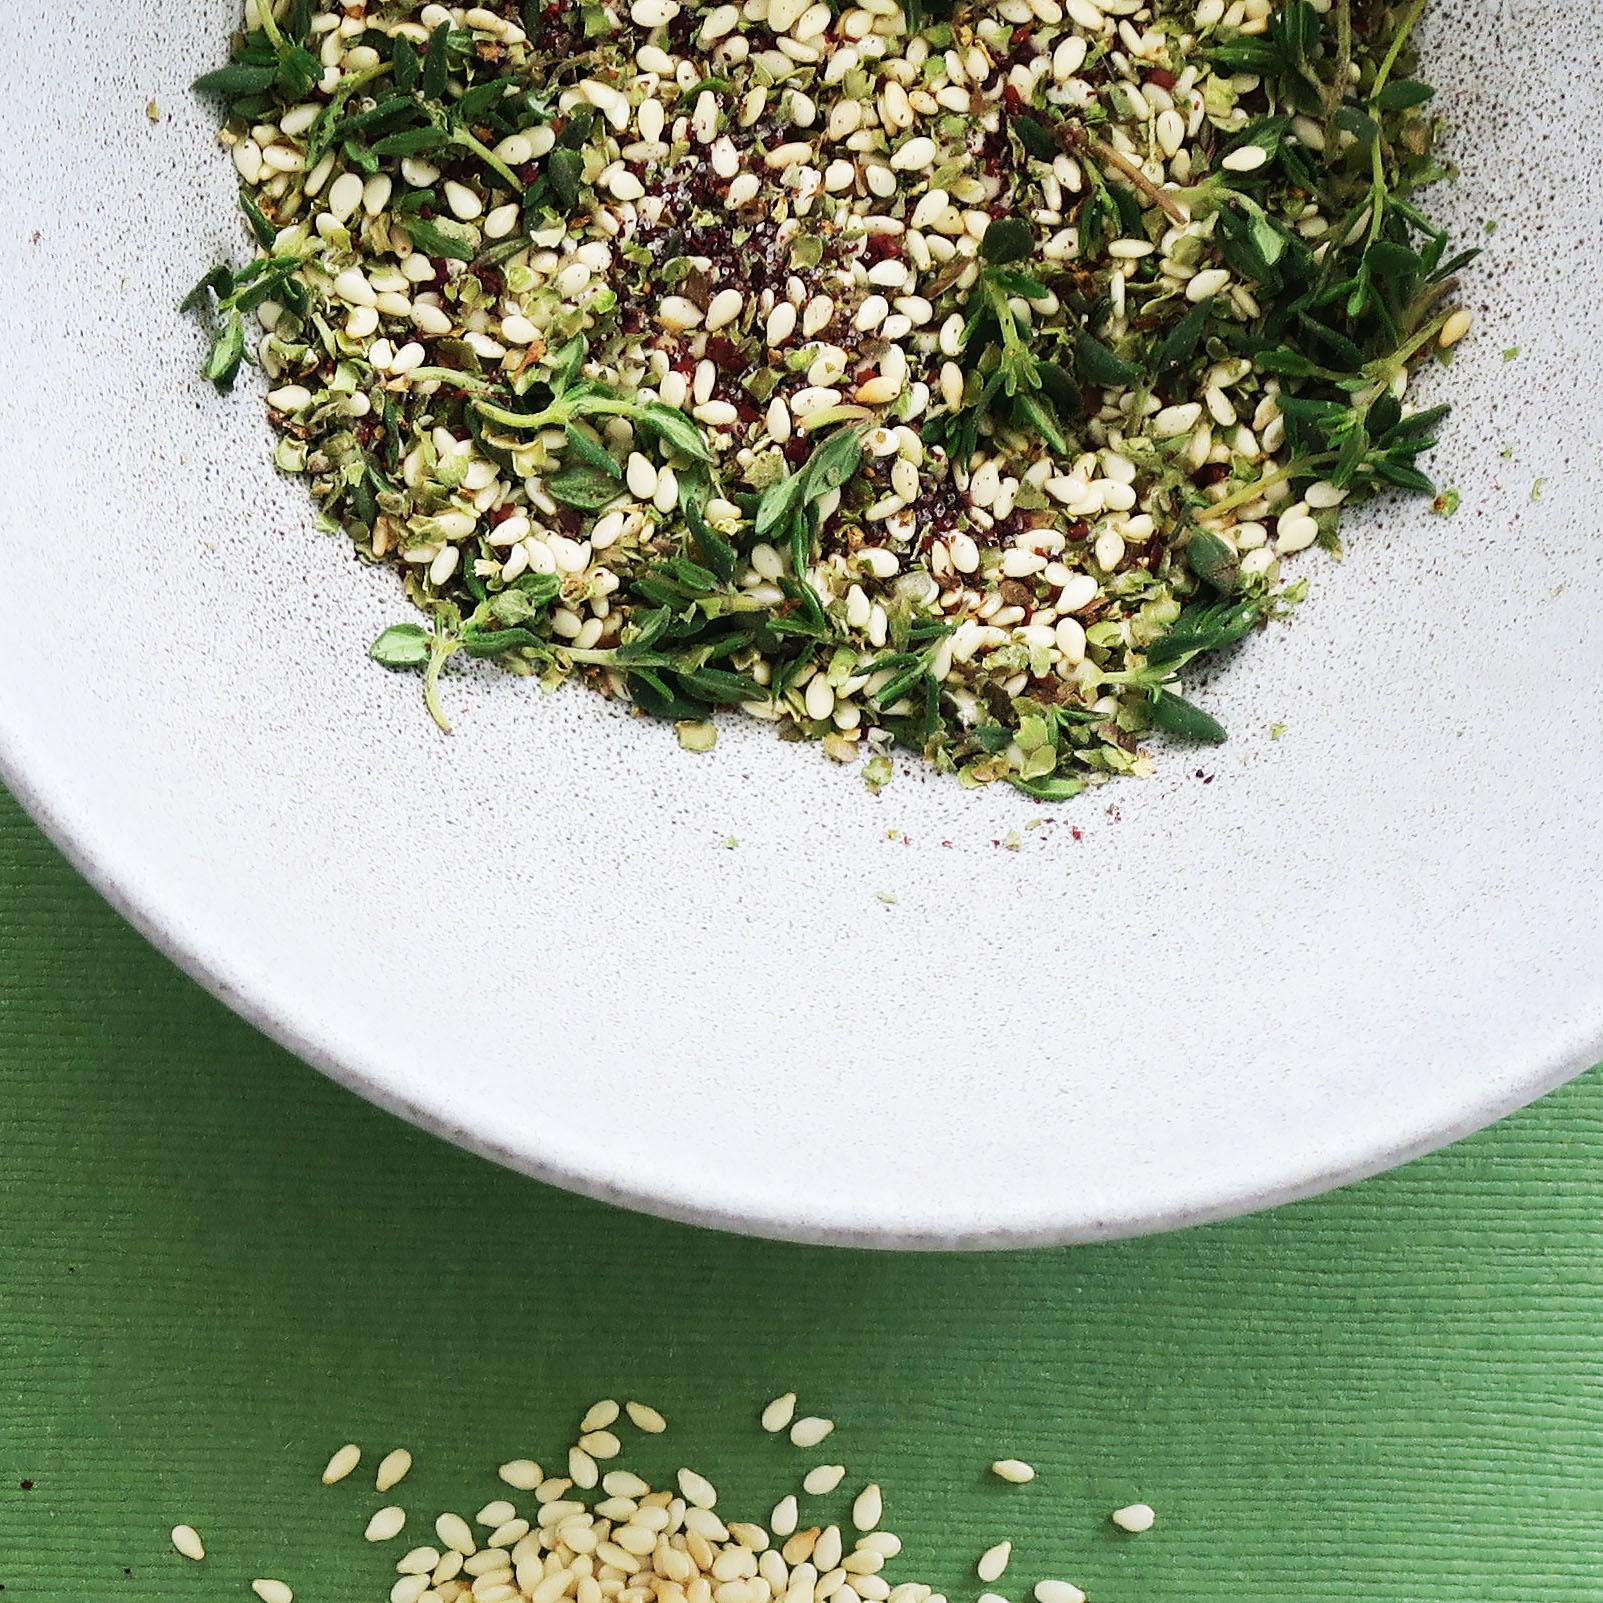 Zatar Spice Blend Recipe